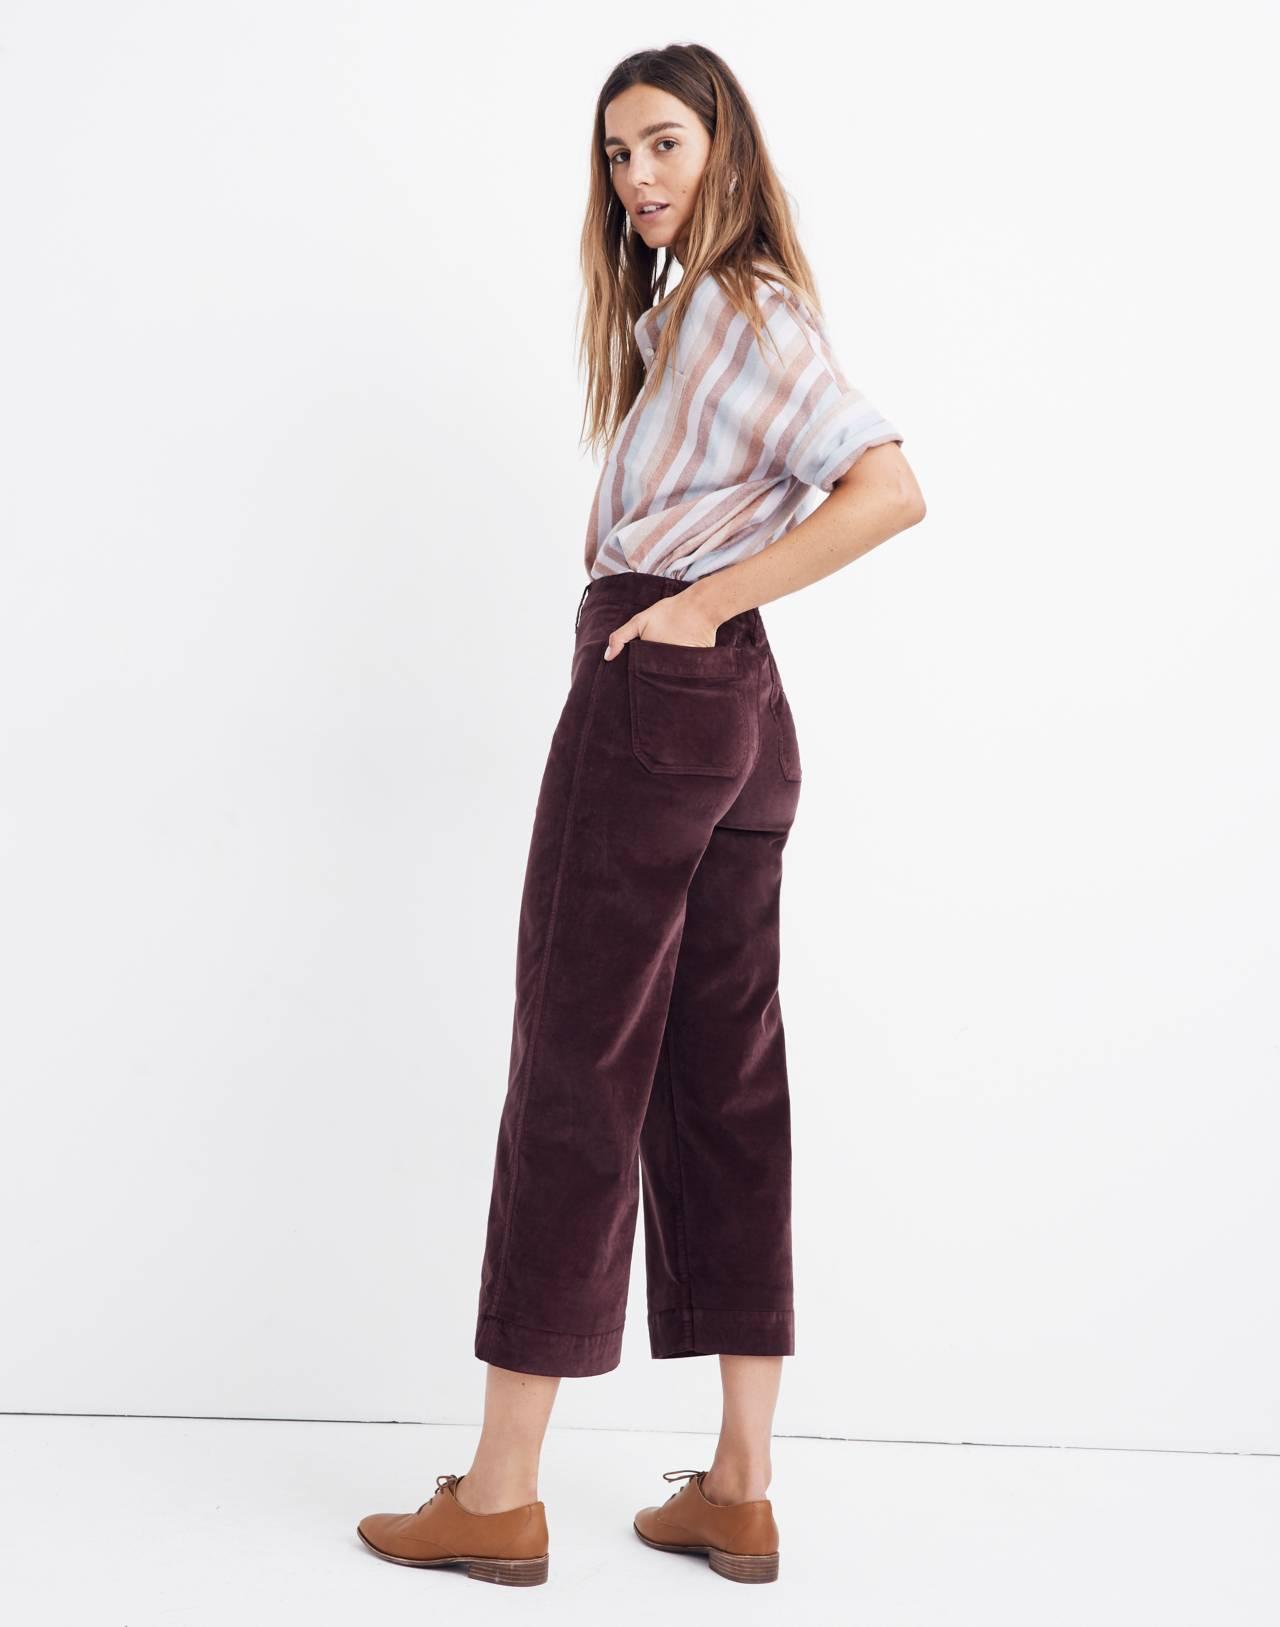 Emmett Wide-Leg Crop Pants in Velveteen in rich plum image 3